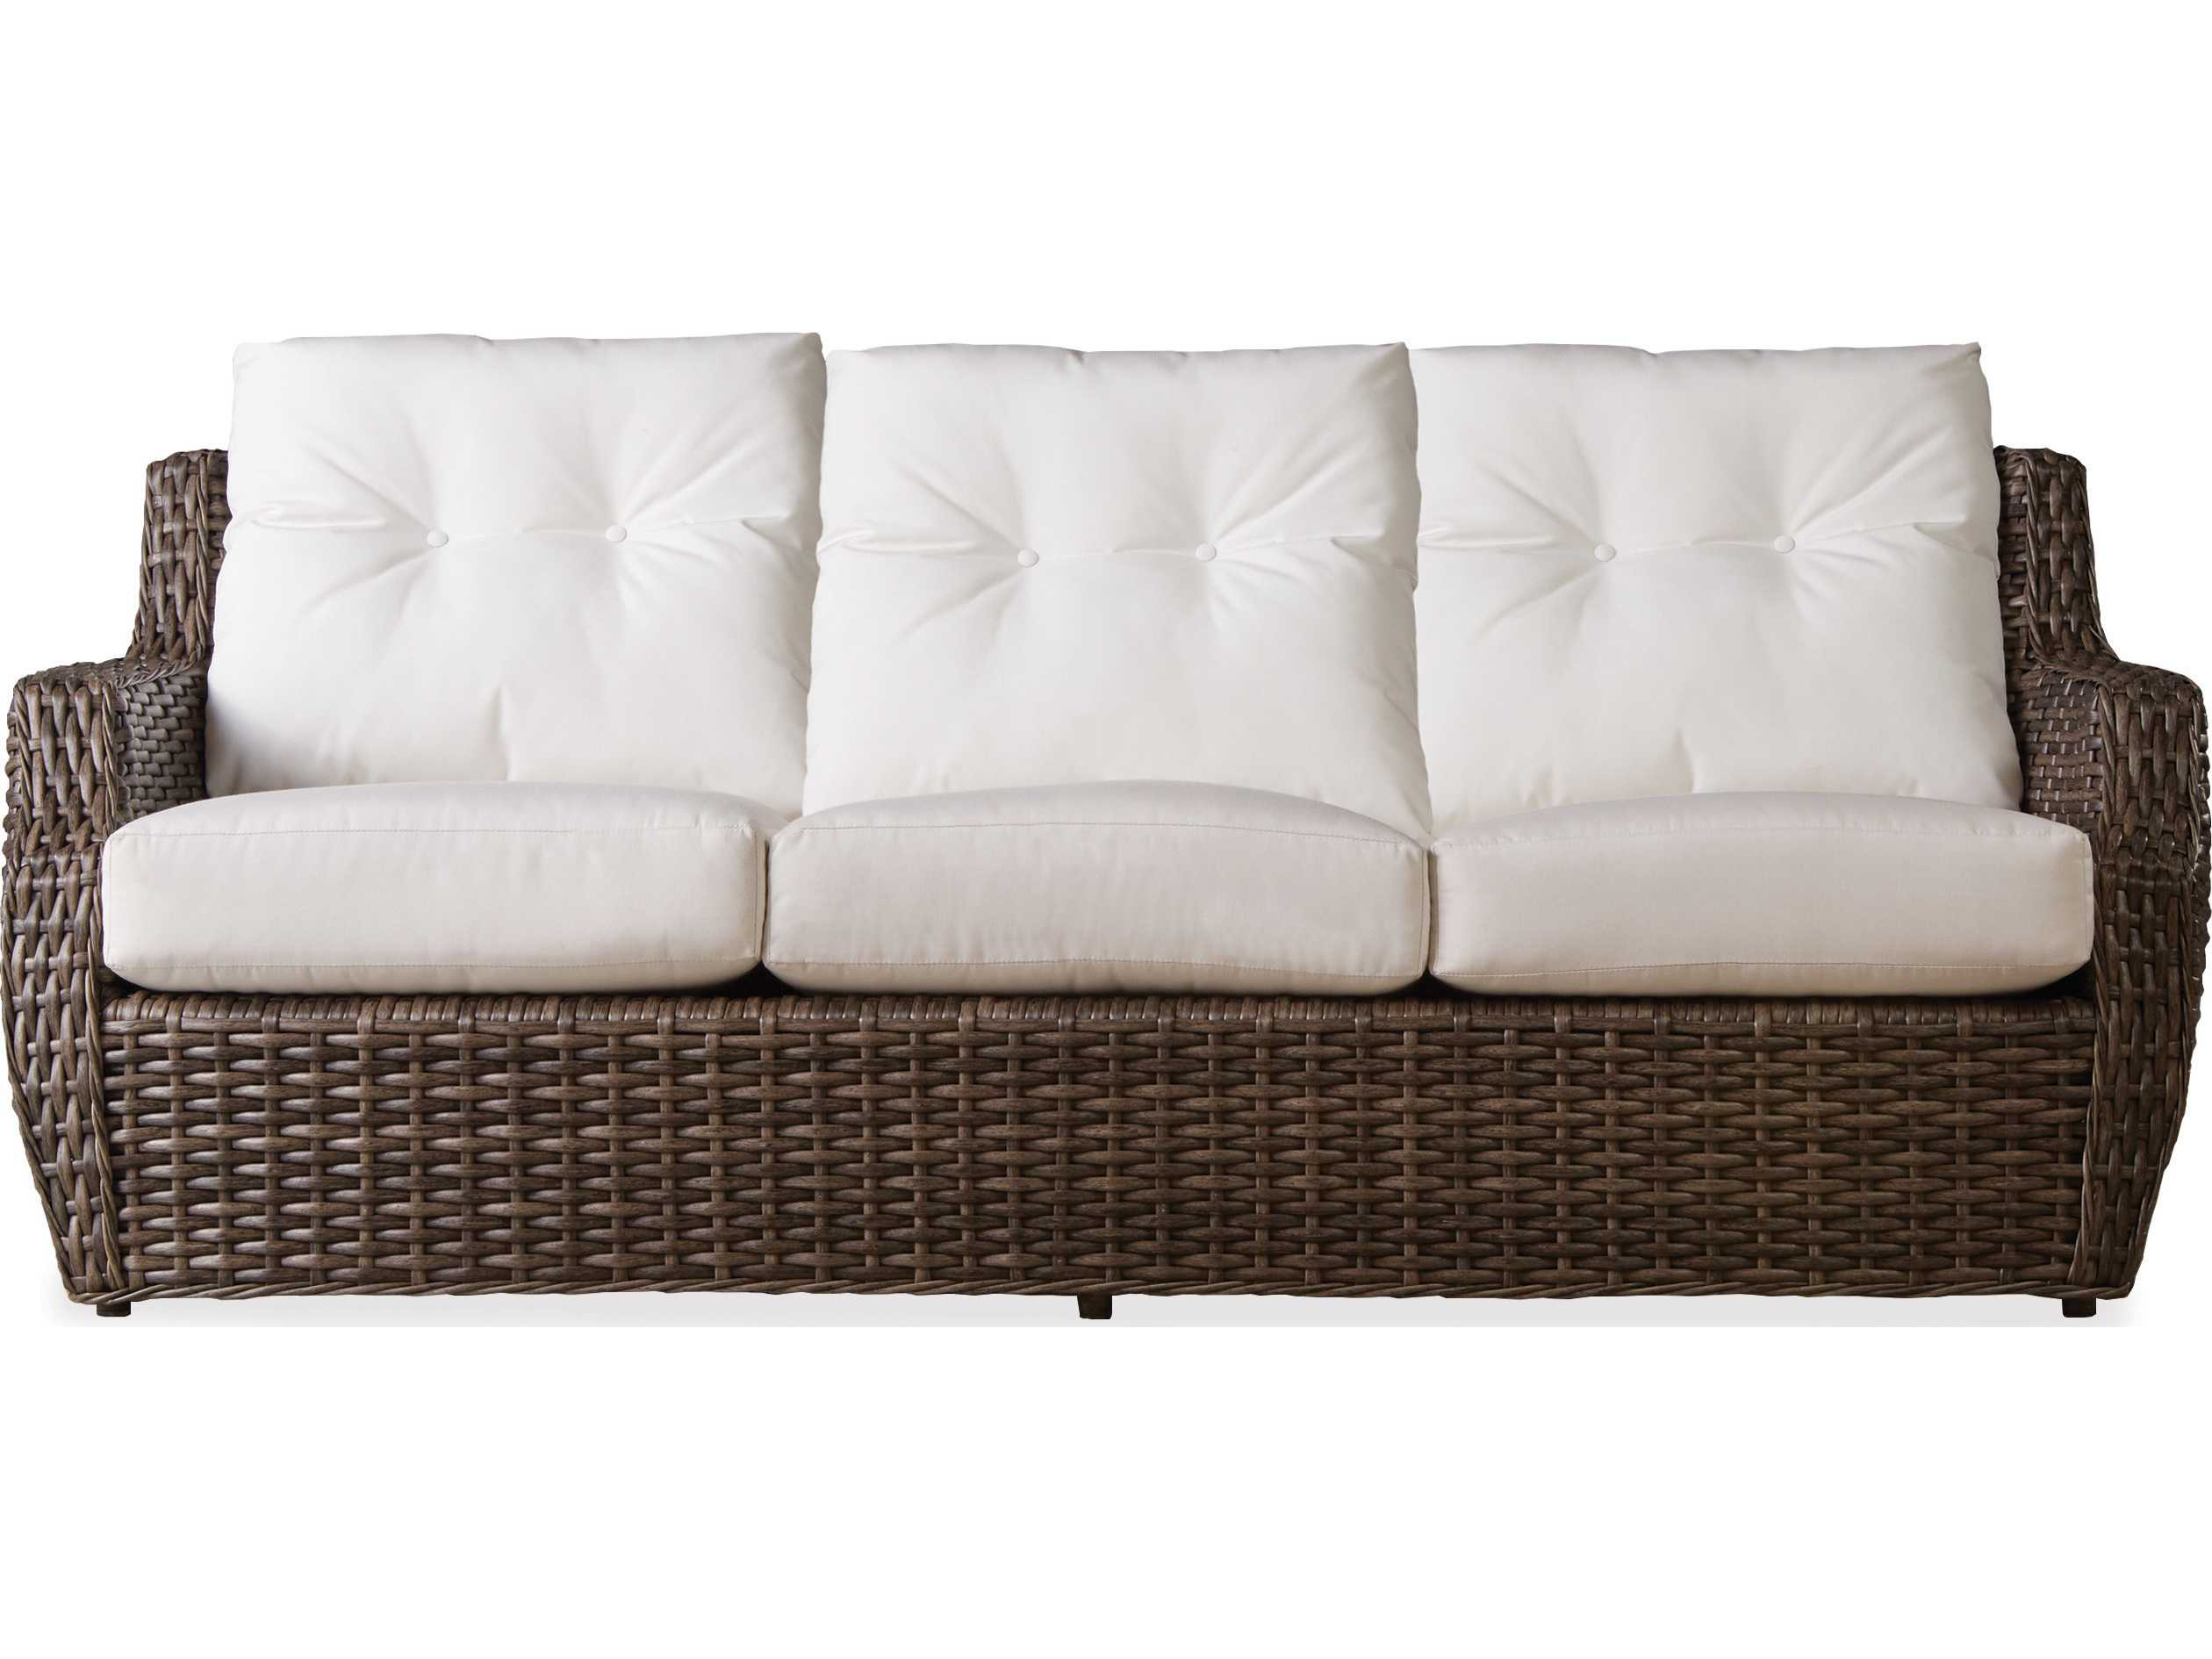 replacement cushions for sofa backs craftmaster jackson leather lloyd flanders largo back cushion 241755